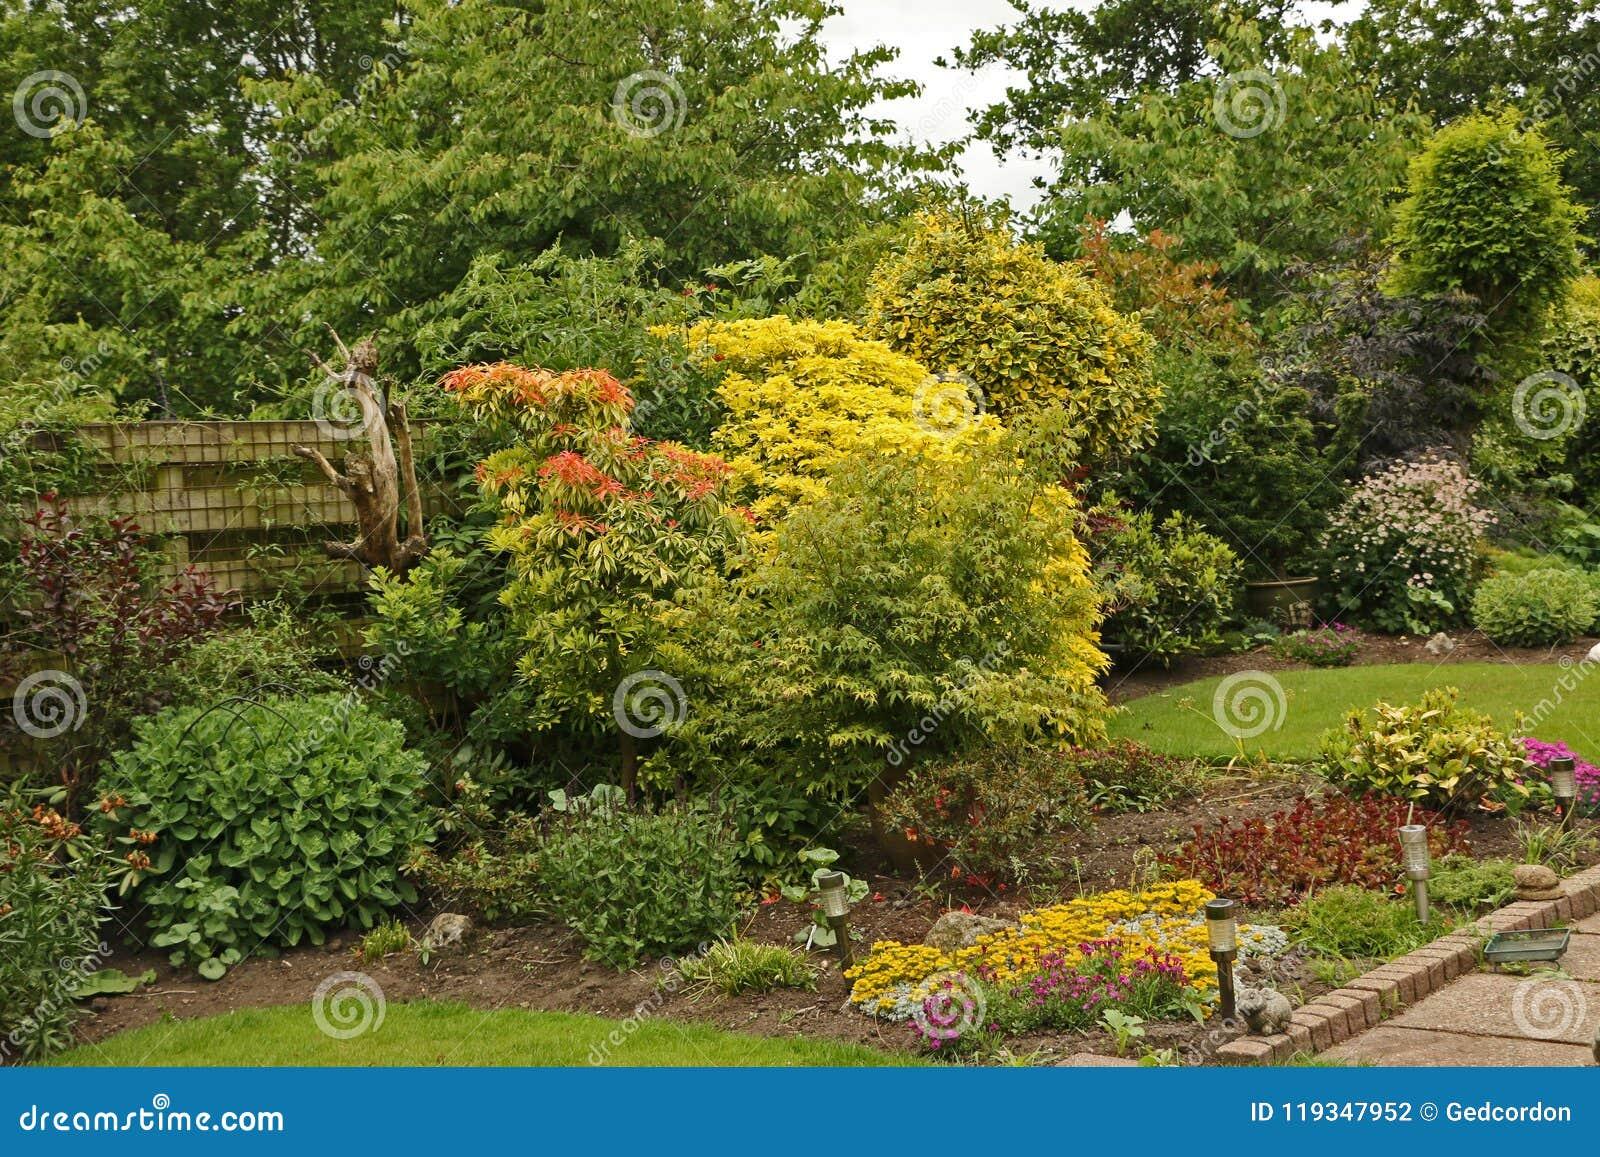 Colourful English Garden Stock Photo Image Of Pathway 119347952